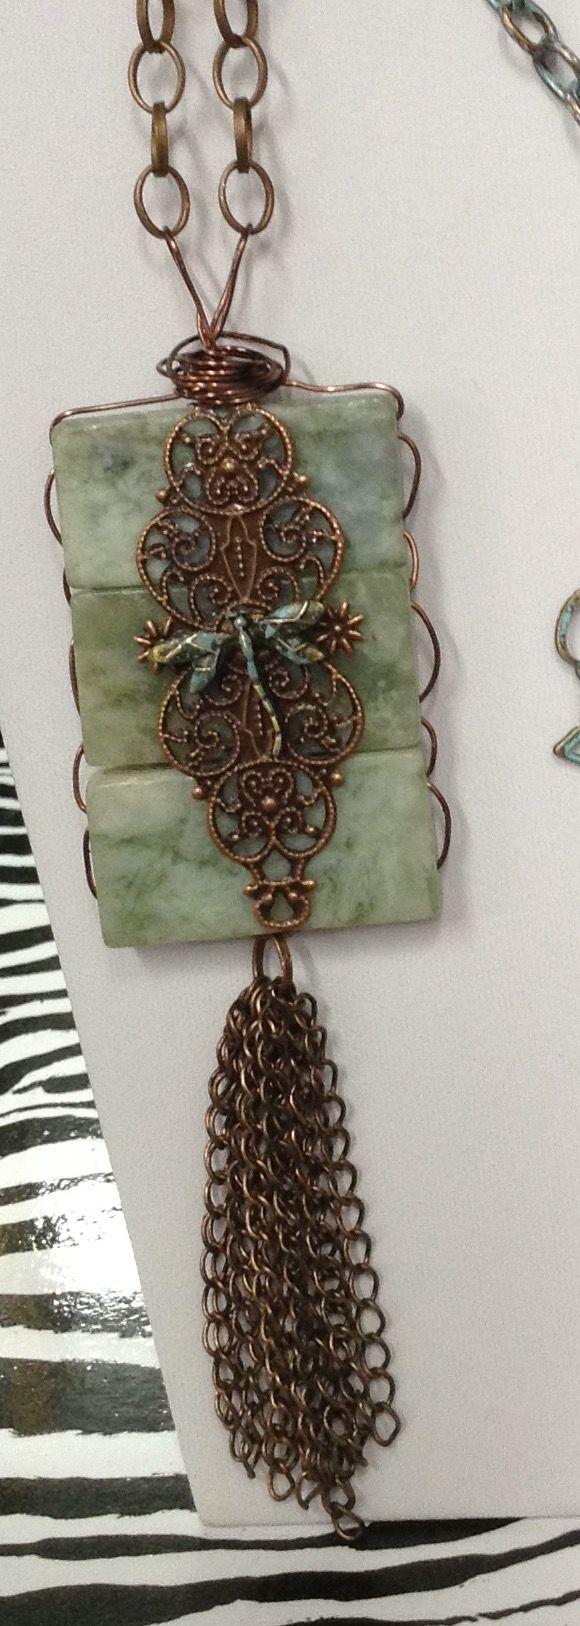 Jade pendant with antique copper embellishments